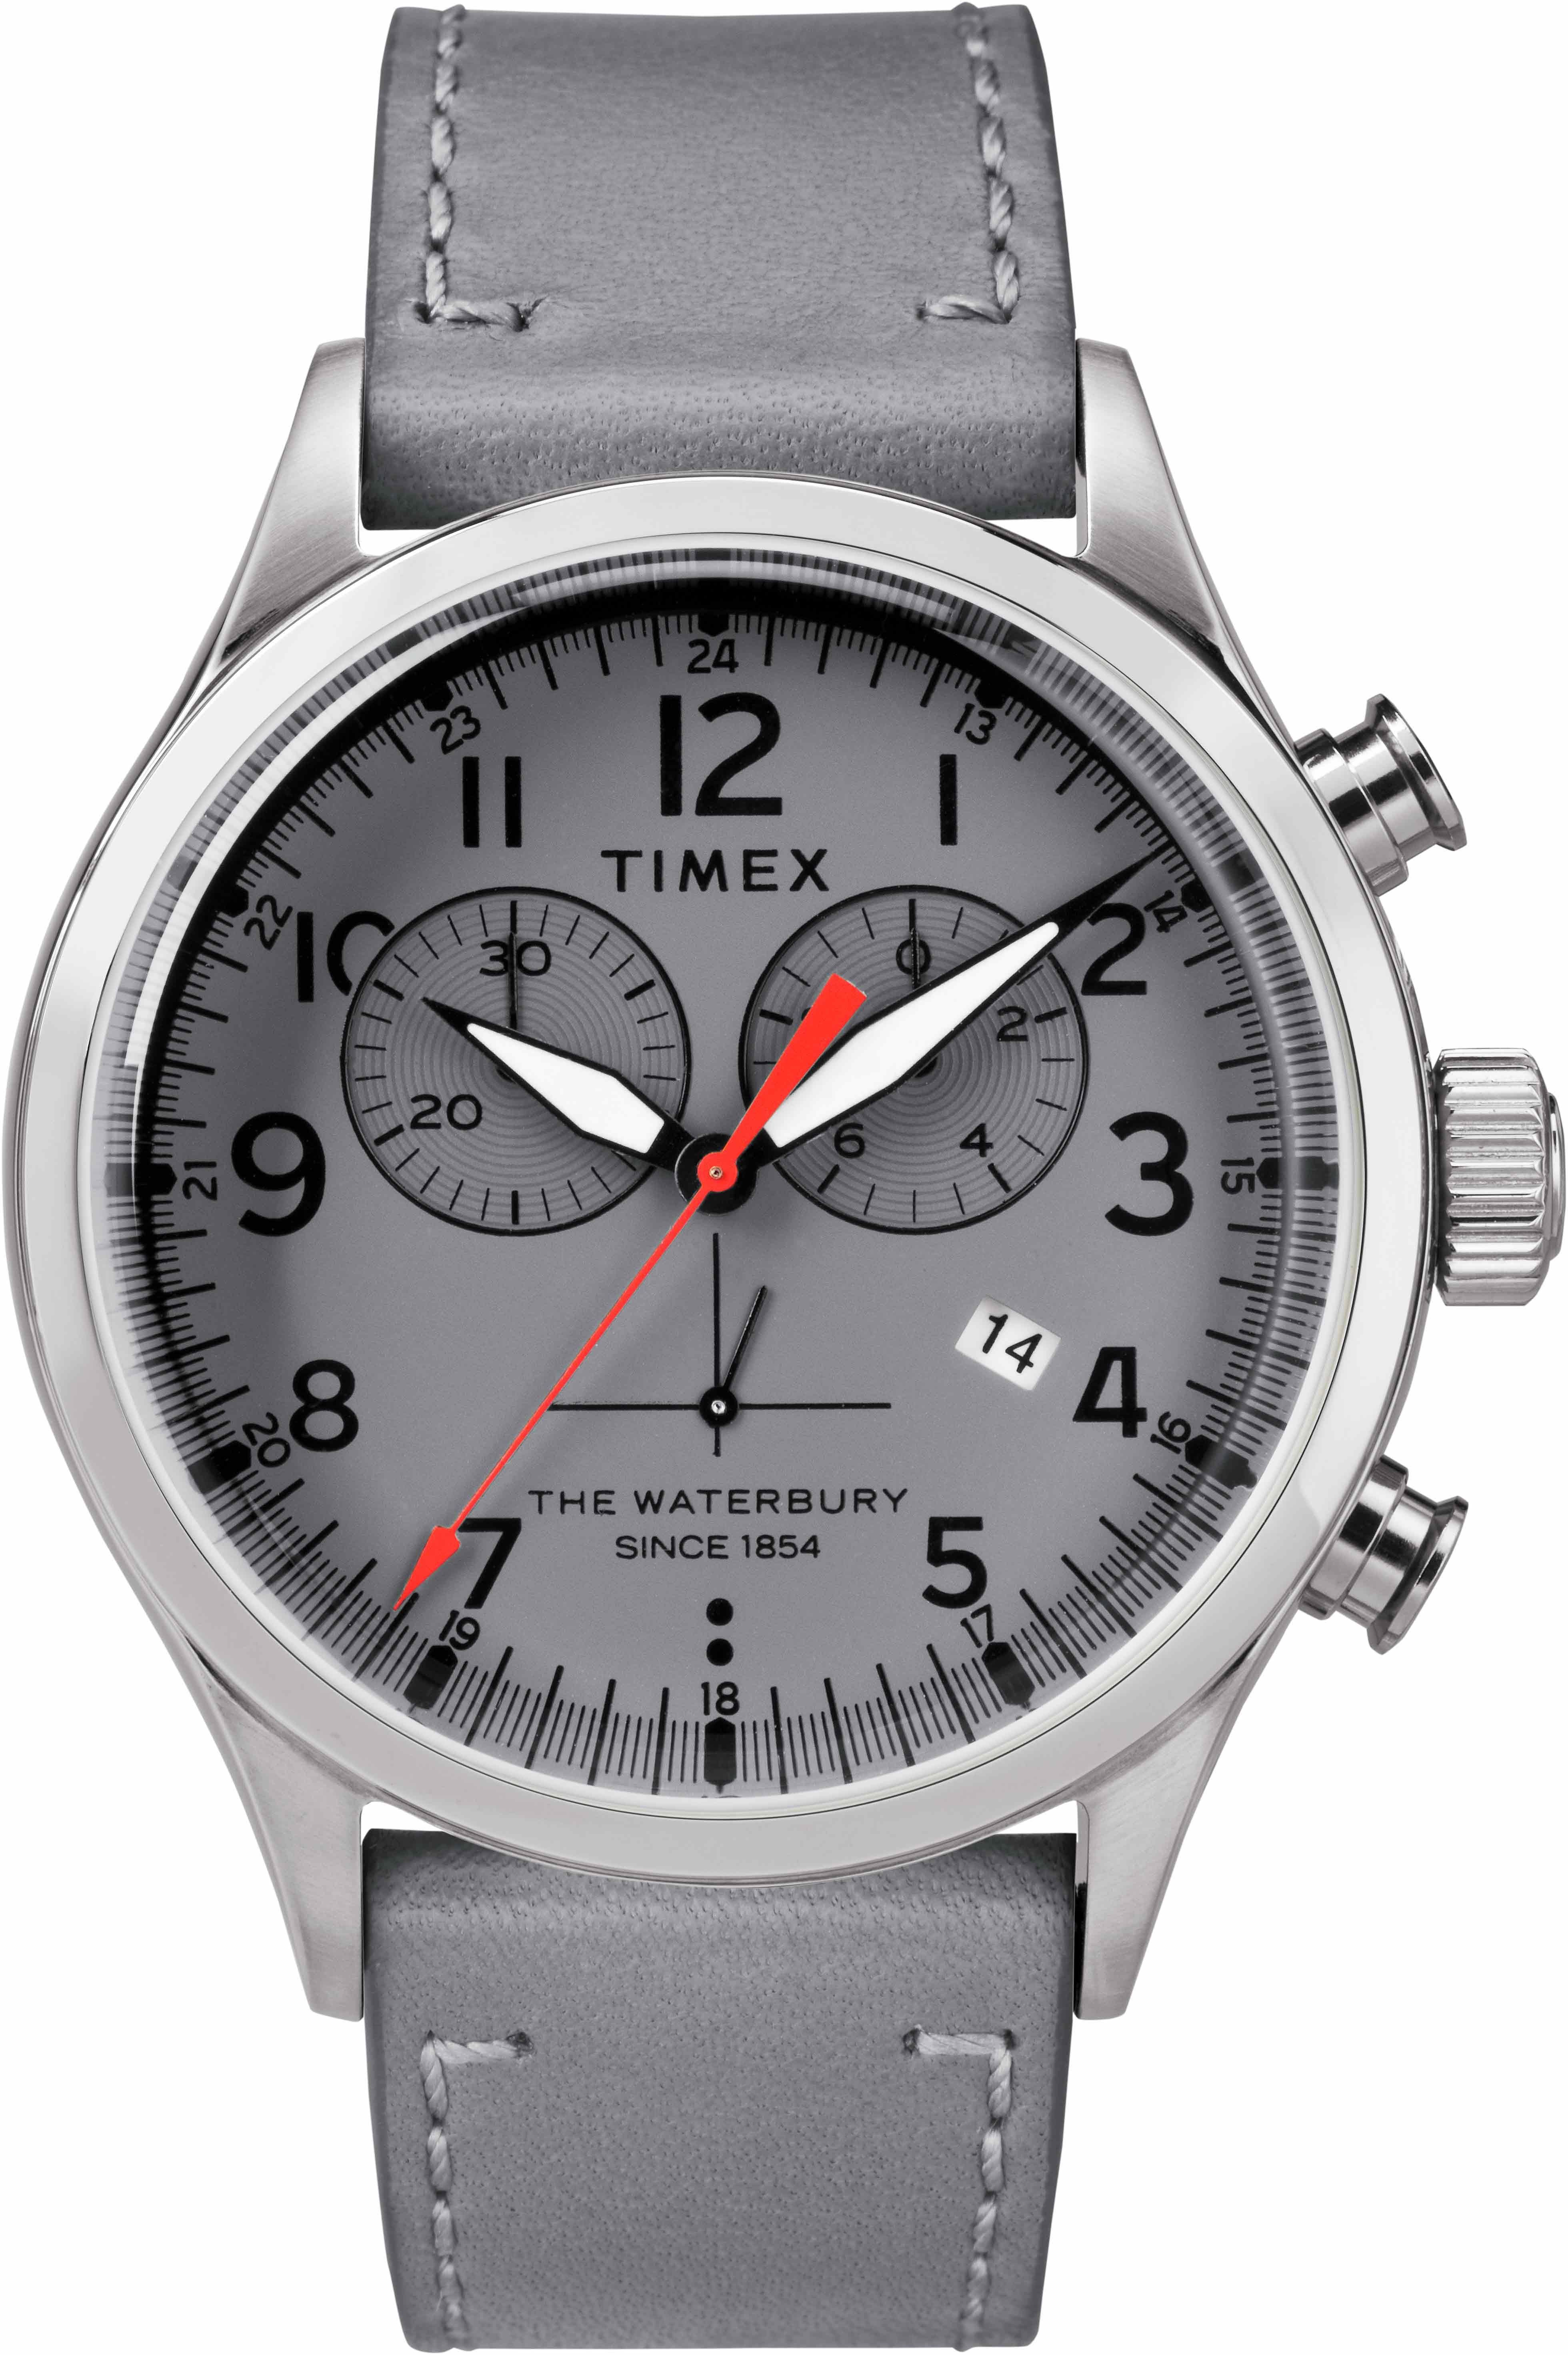 Timex gray chronograph watch.